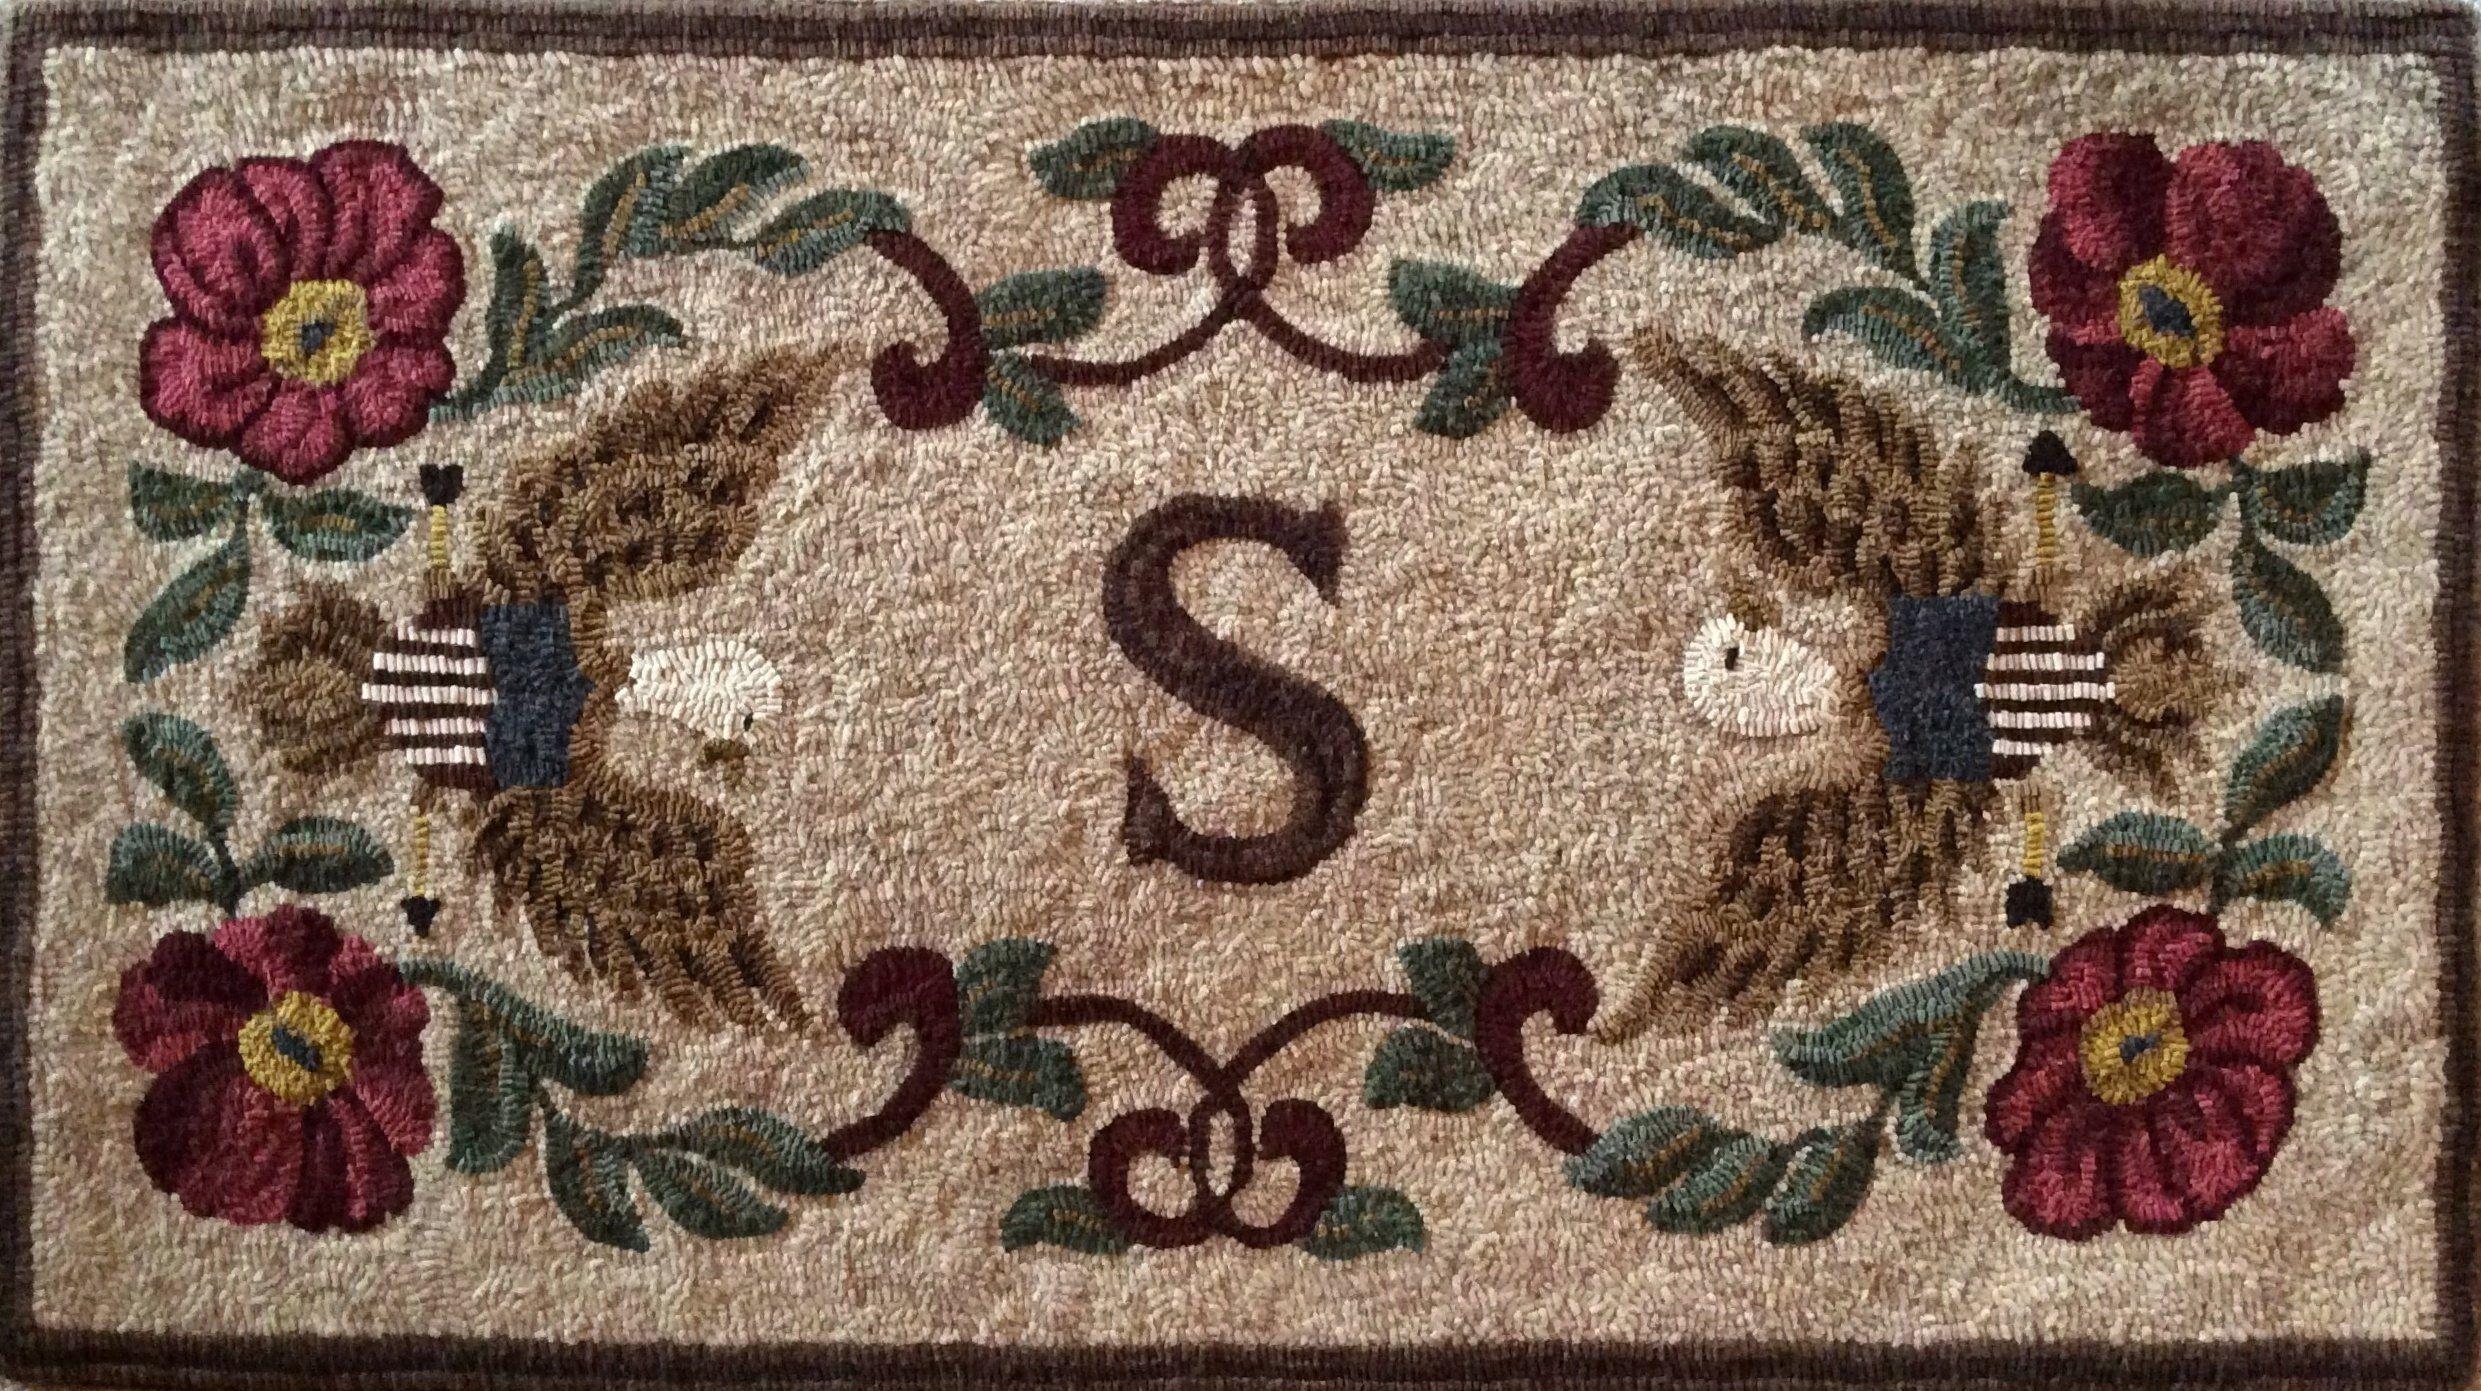 1321 Centennial Legacy Rug hooking patterns, Hooked